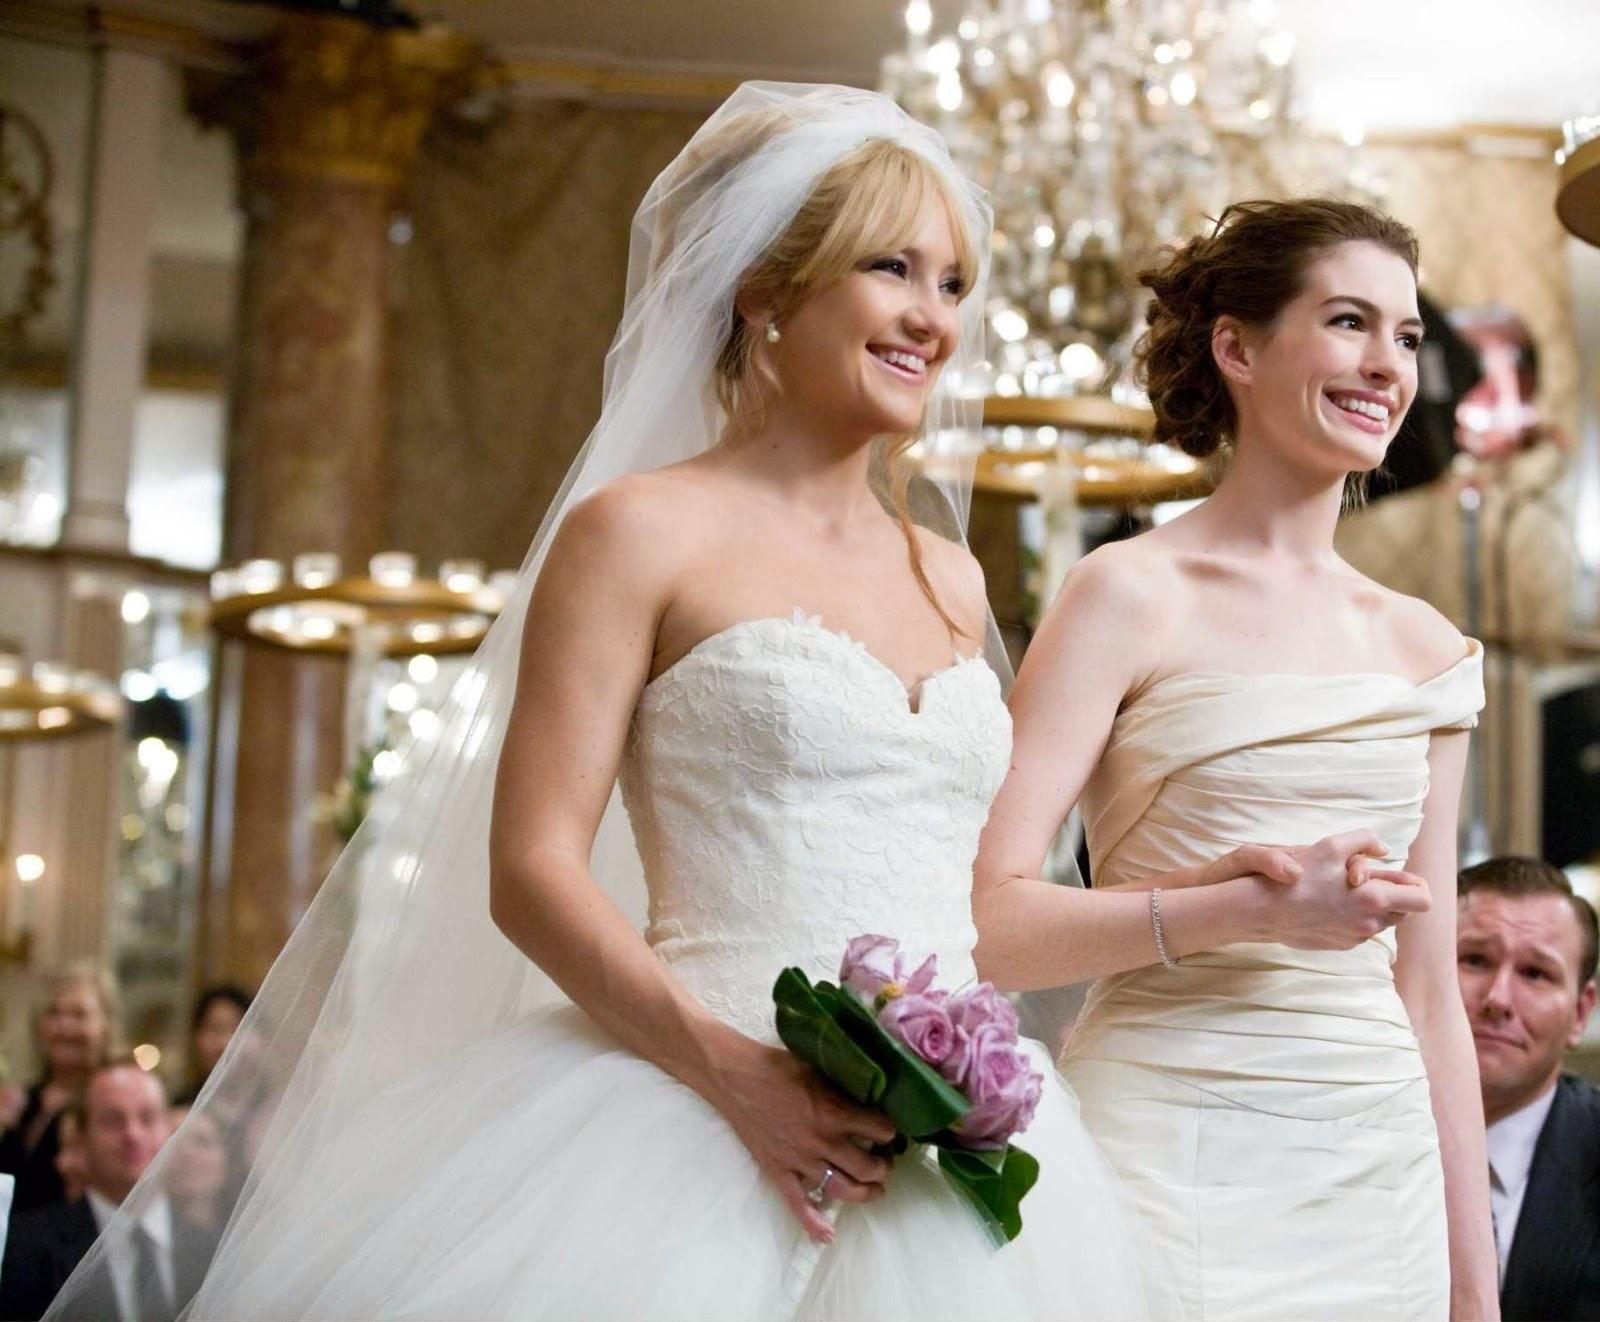 Игра: угадай страну по свадебному наряду